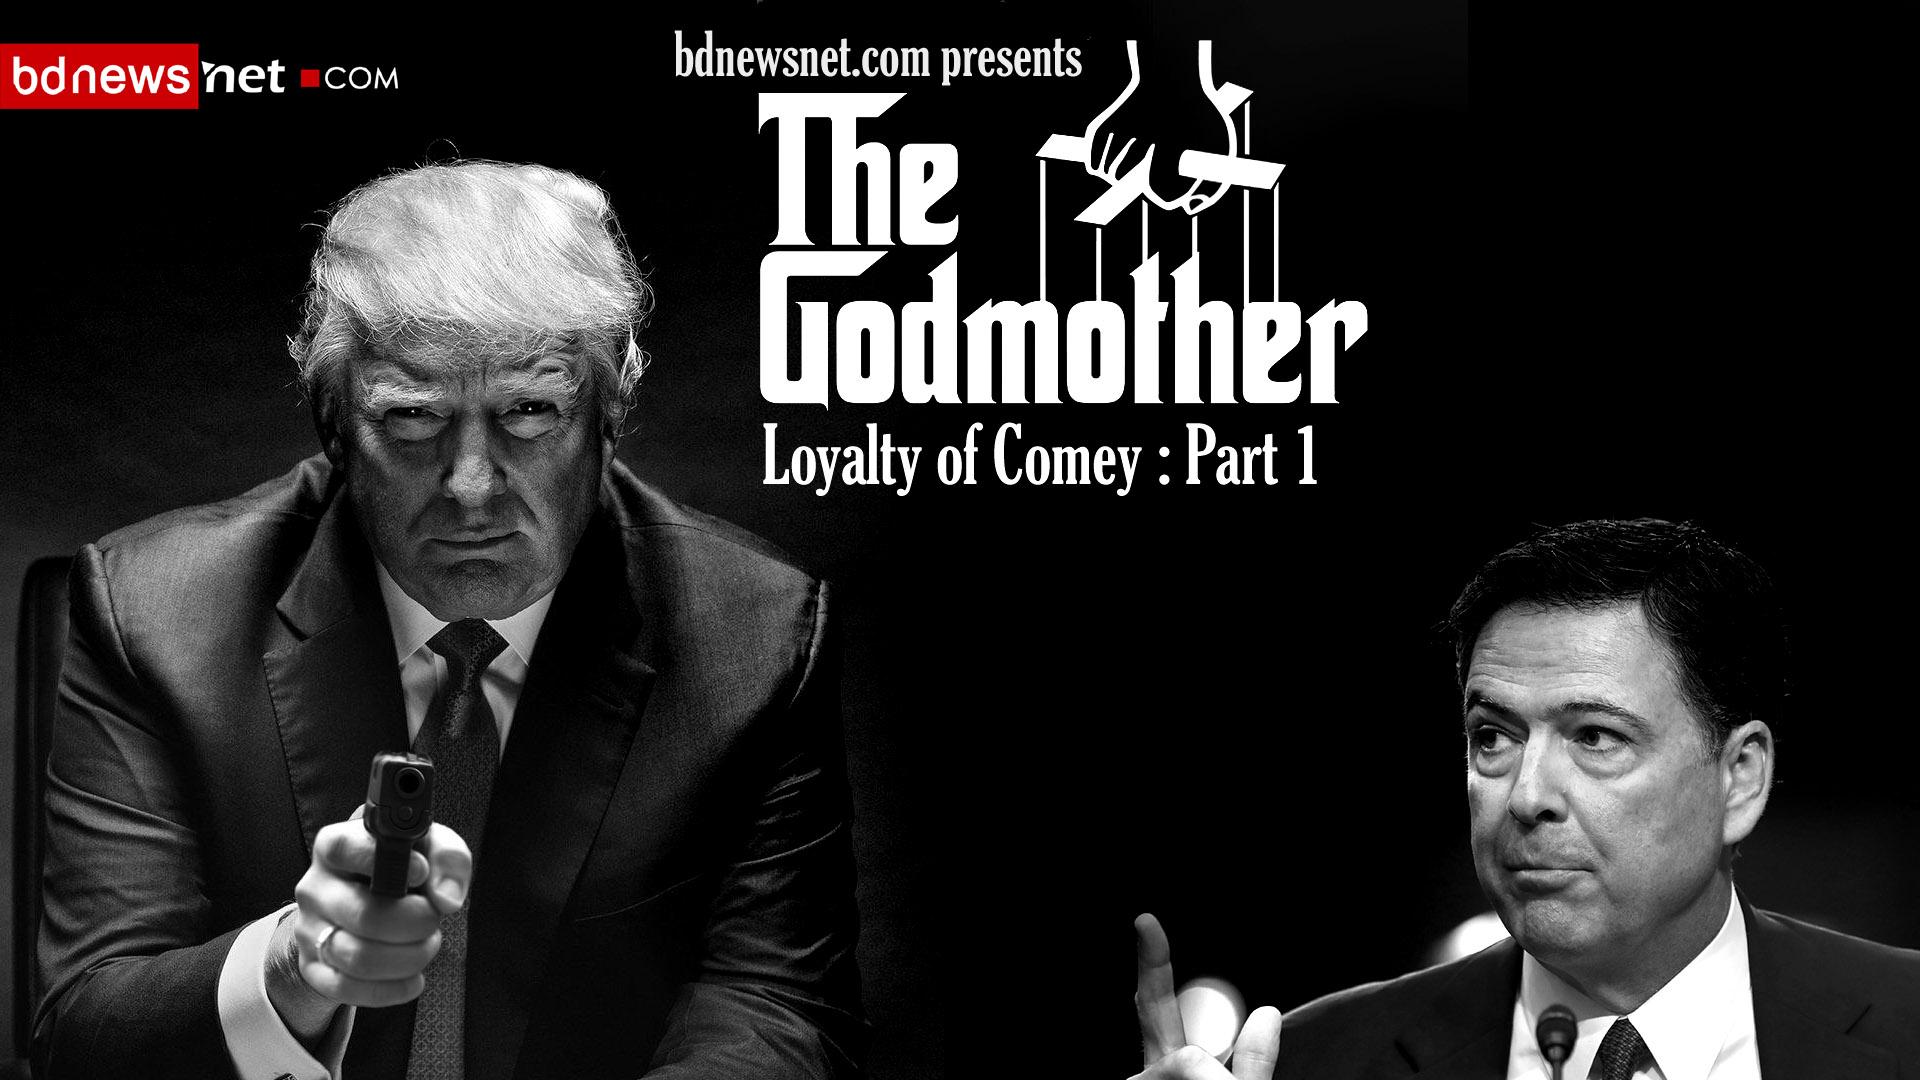 trump-comey-mafia-godfather-loyalty-2018-baddass-